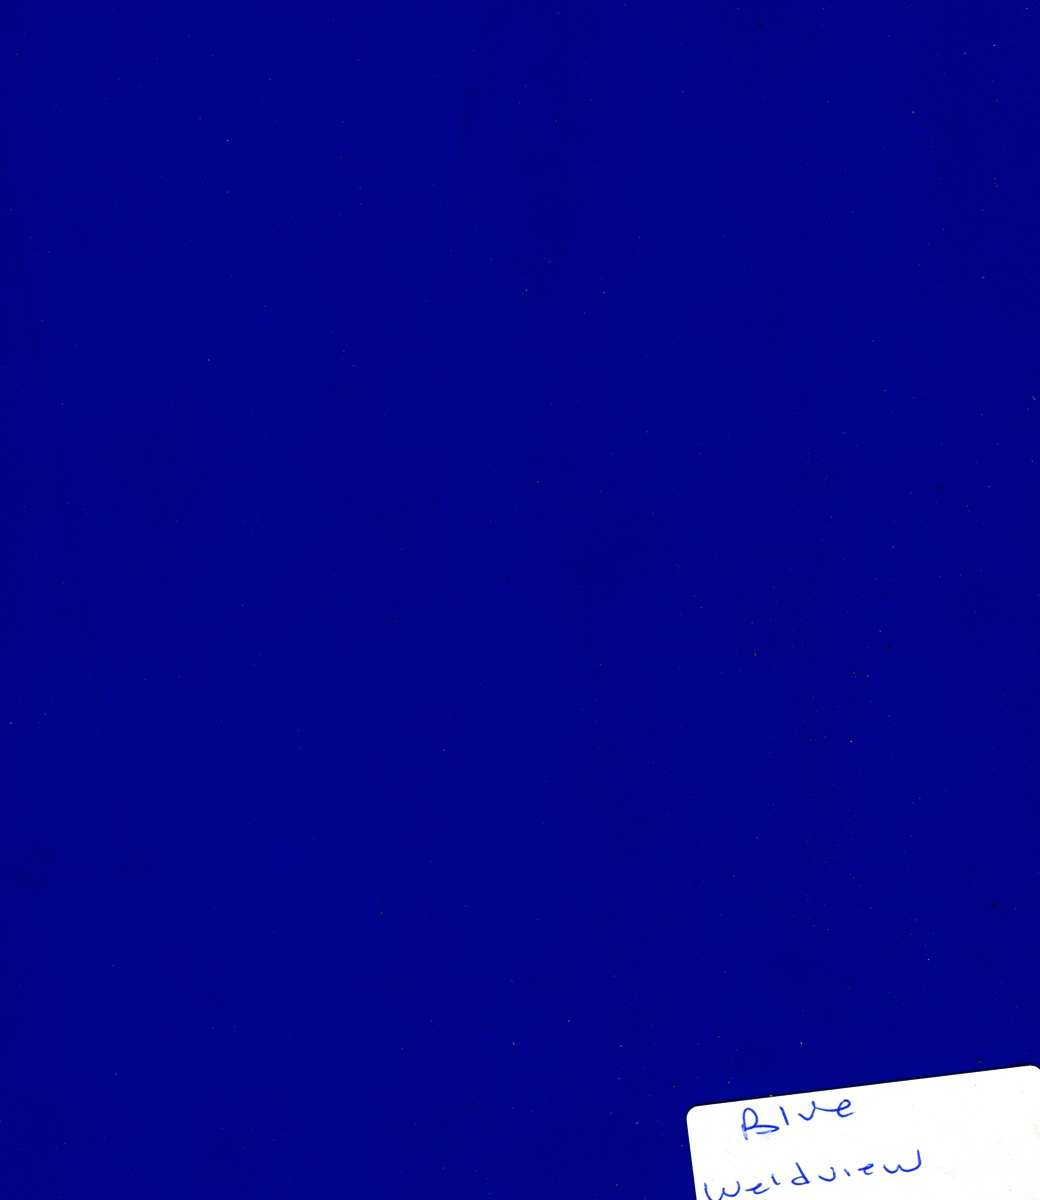 "TRANSPARENT VINYLFOR WELDING CURTAINS 64"" BLUE"